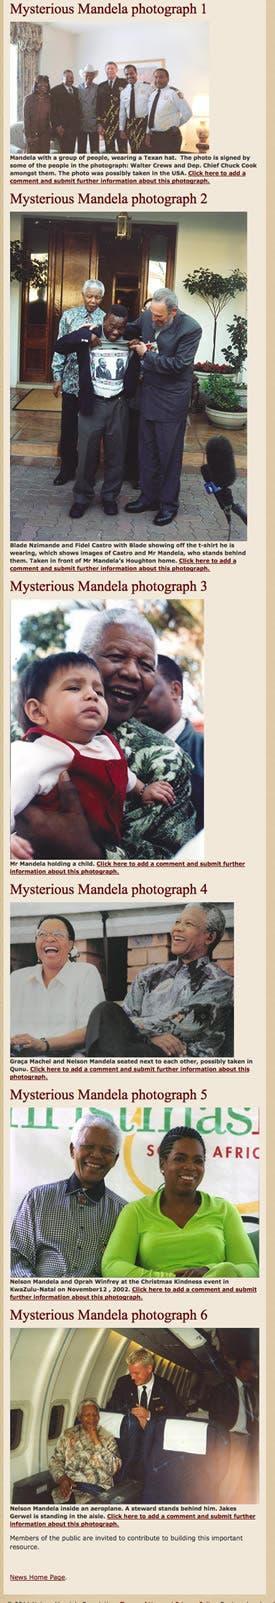 Mystery Nelson Mandela Photos